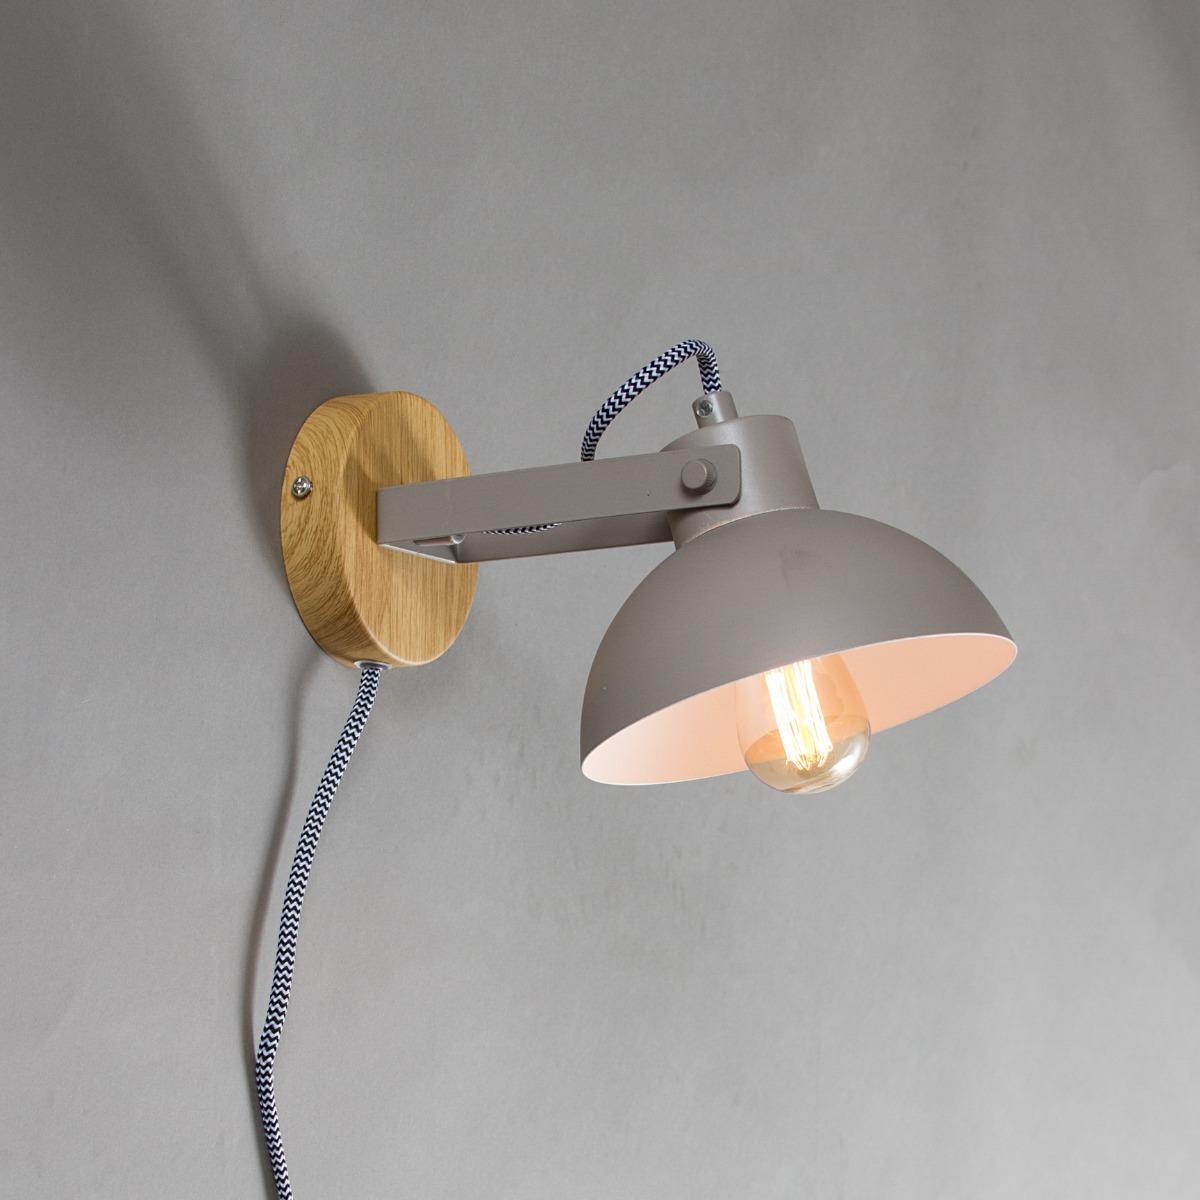 7ba88ca8334 Luminaria De Pared Gris Metal Con Aplique Simil Madera Zum -   1.250 ...